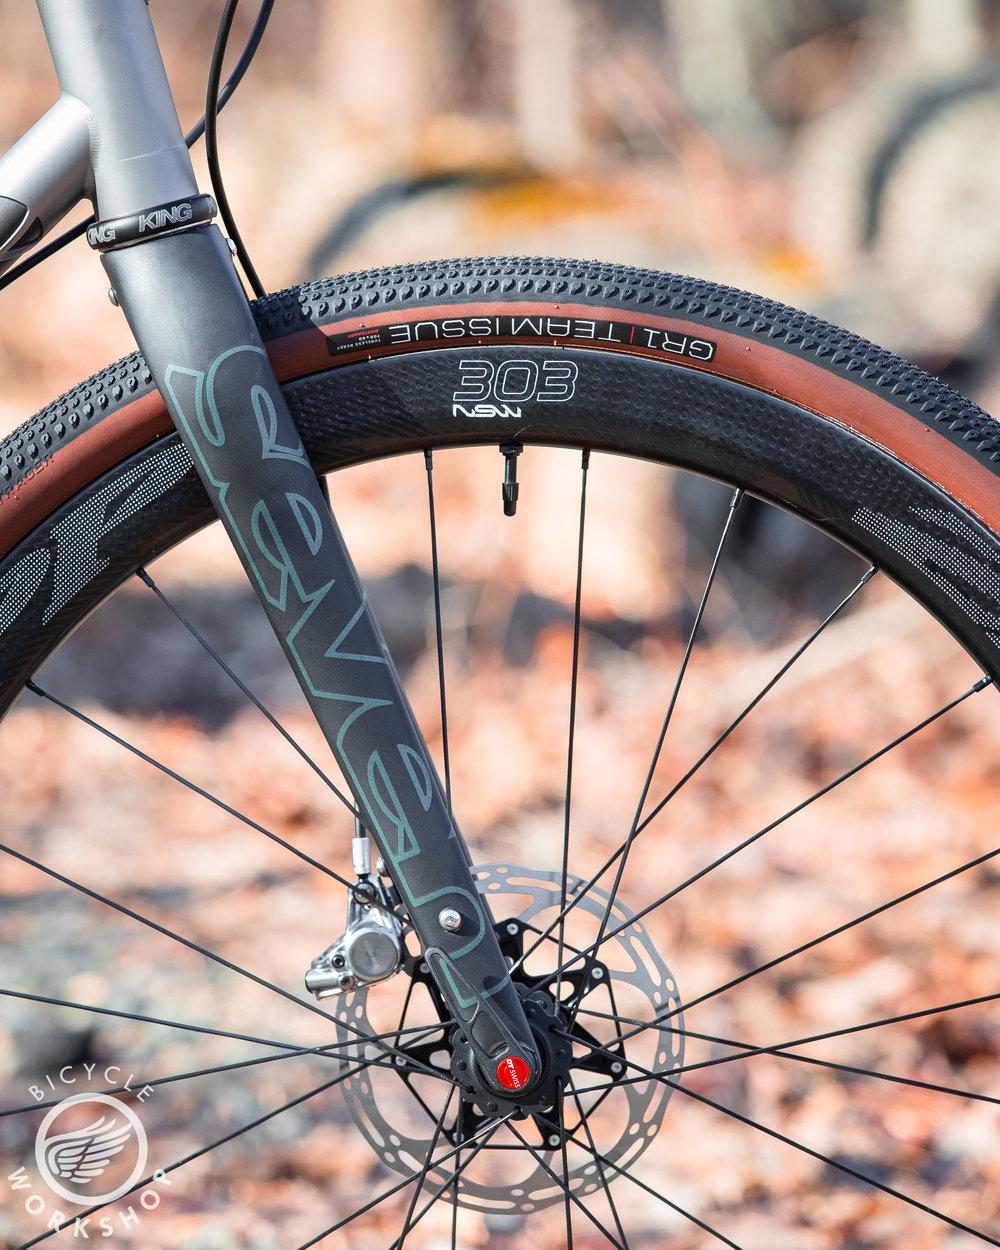 Zipp 303 NSW wheels with Bontrager GR1 tires